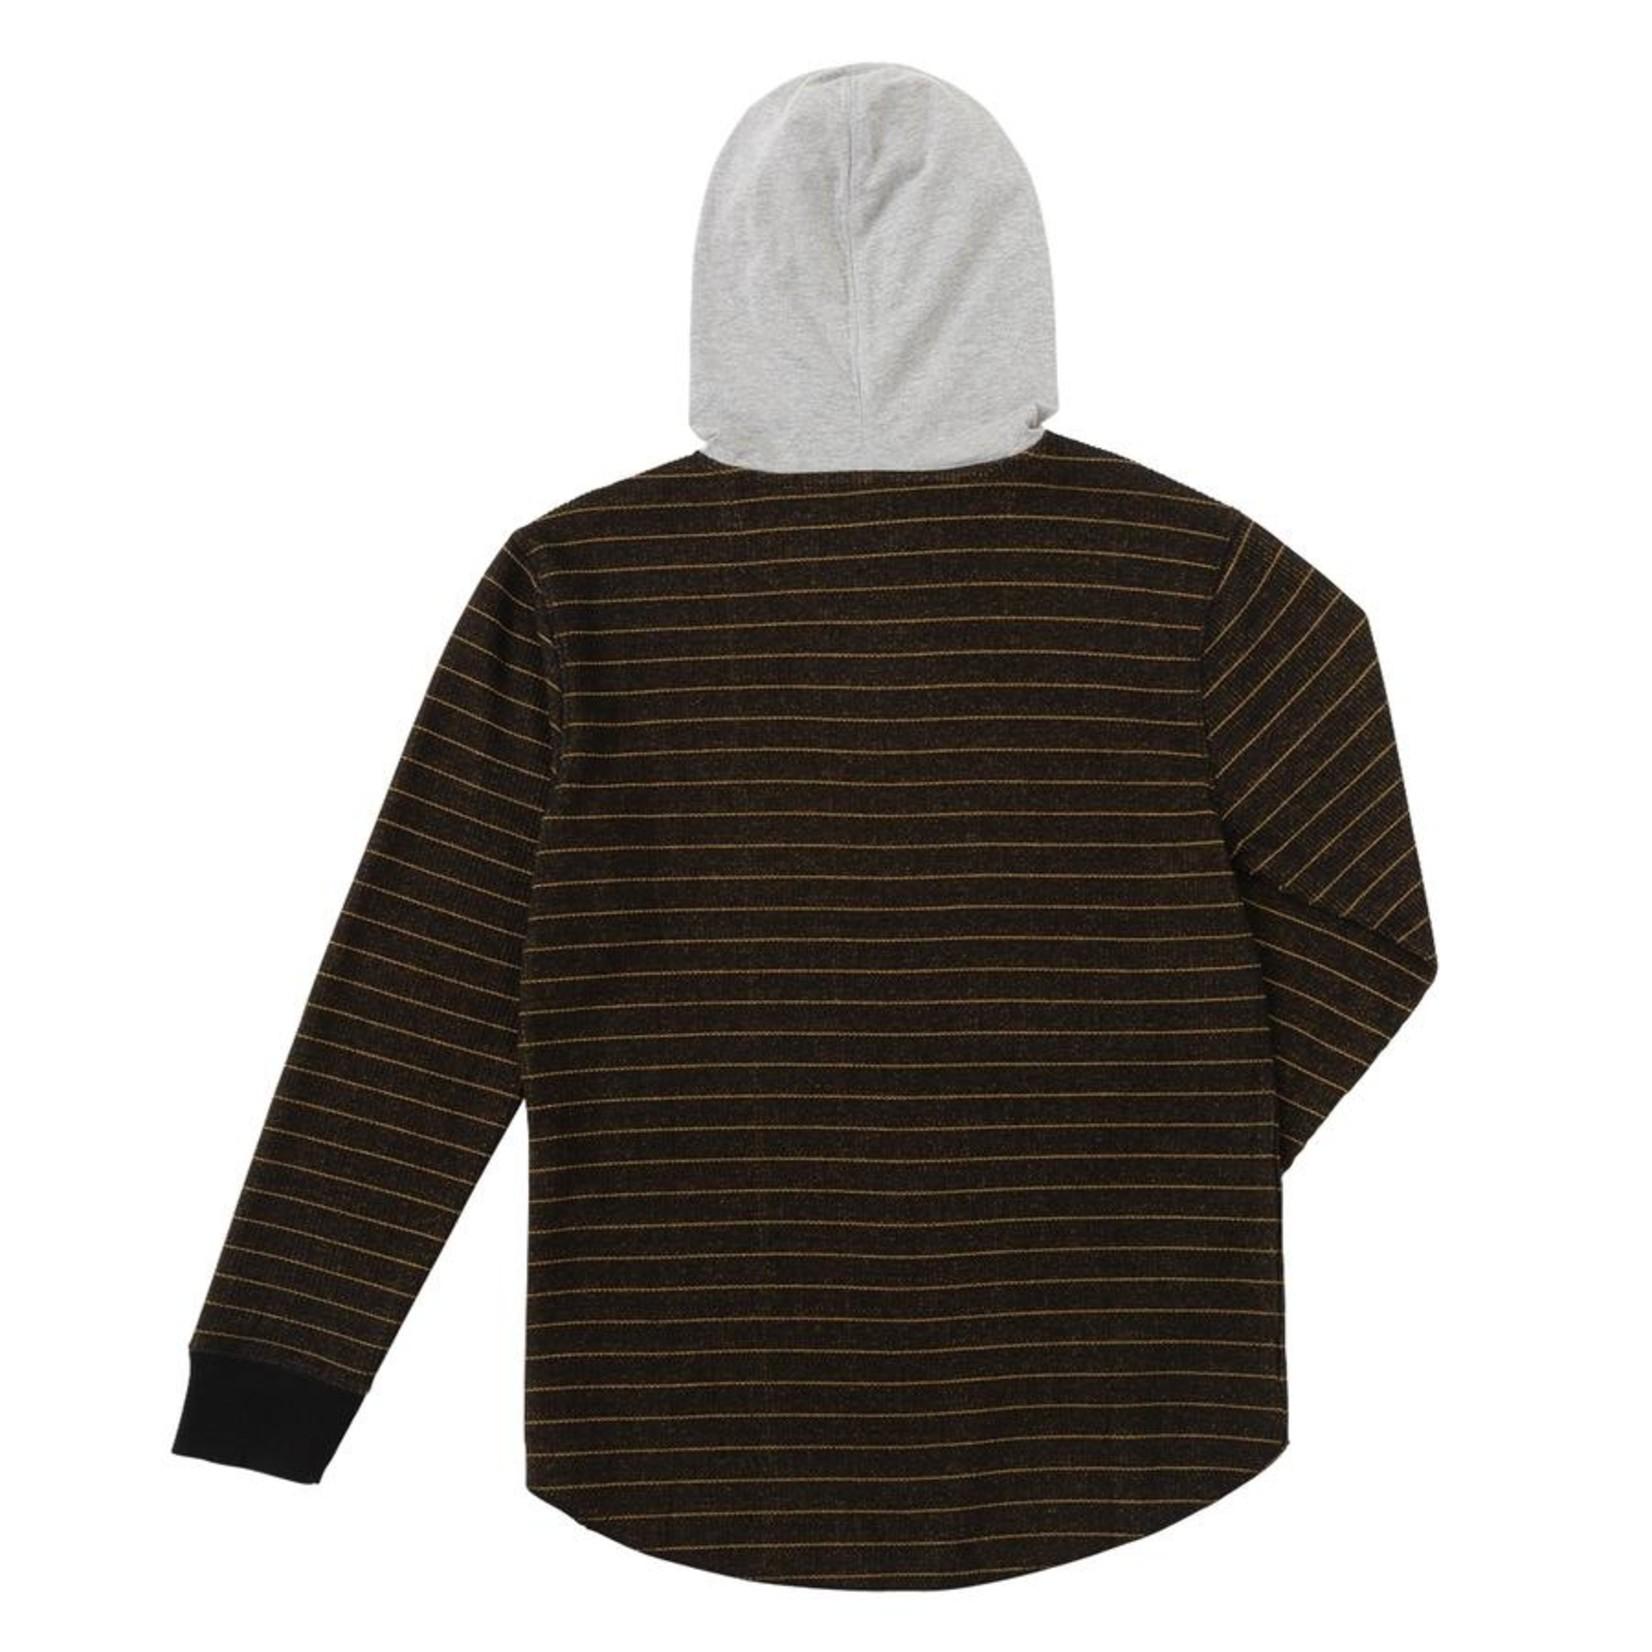 Dark Seas Dark Seas Acadia Knit